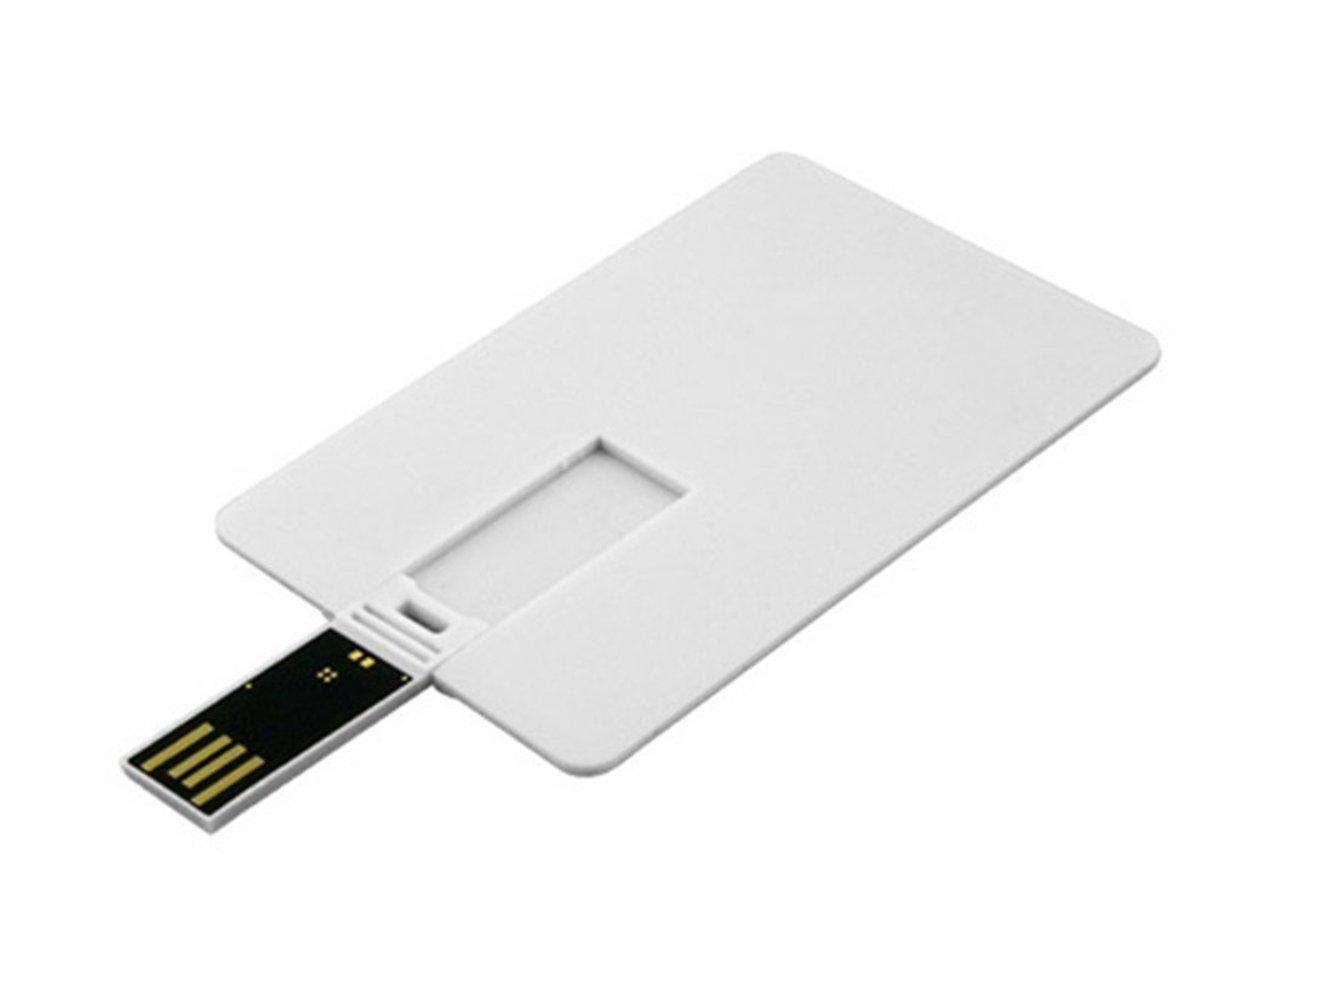 Aneew - Memoria USB, diseño de tarjeta de crédito, color negro (16.00 GB)